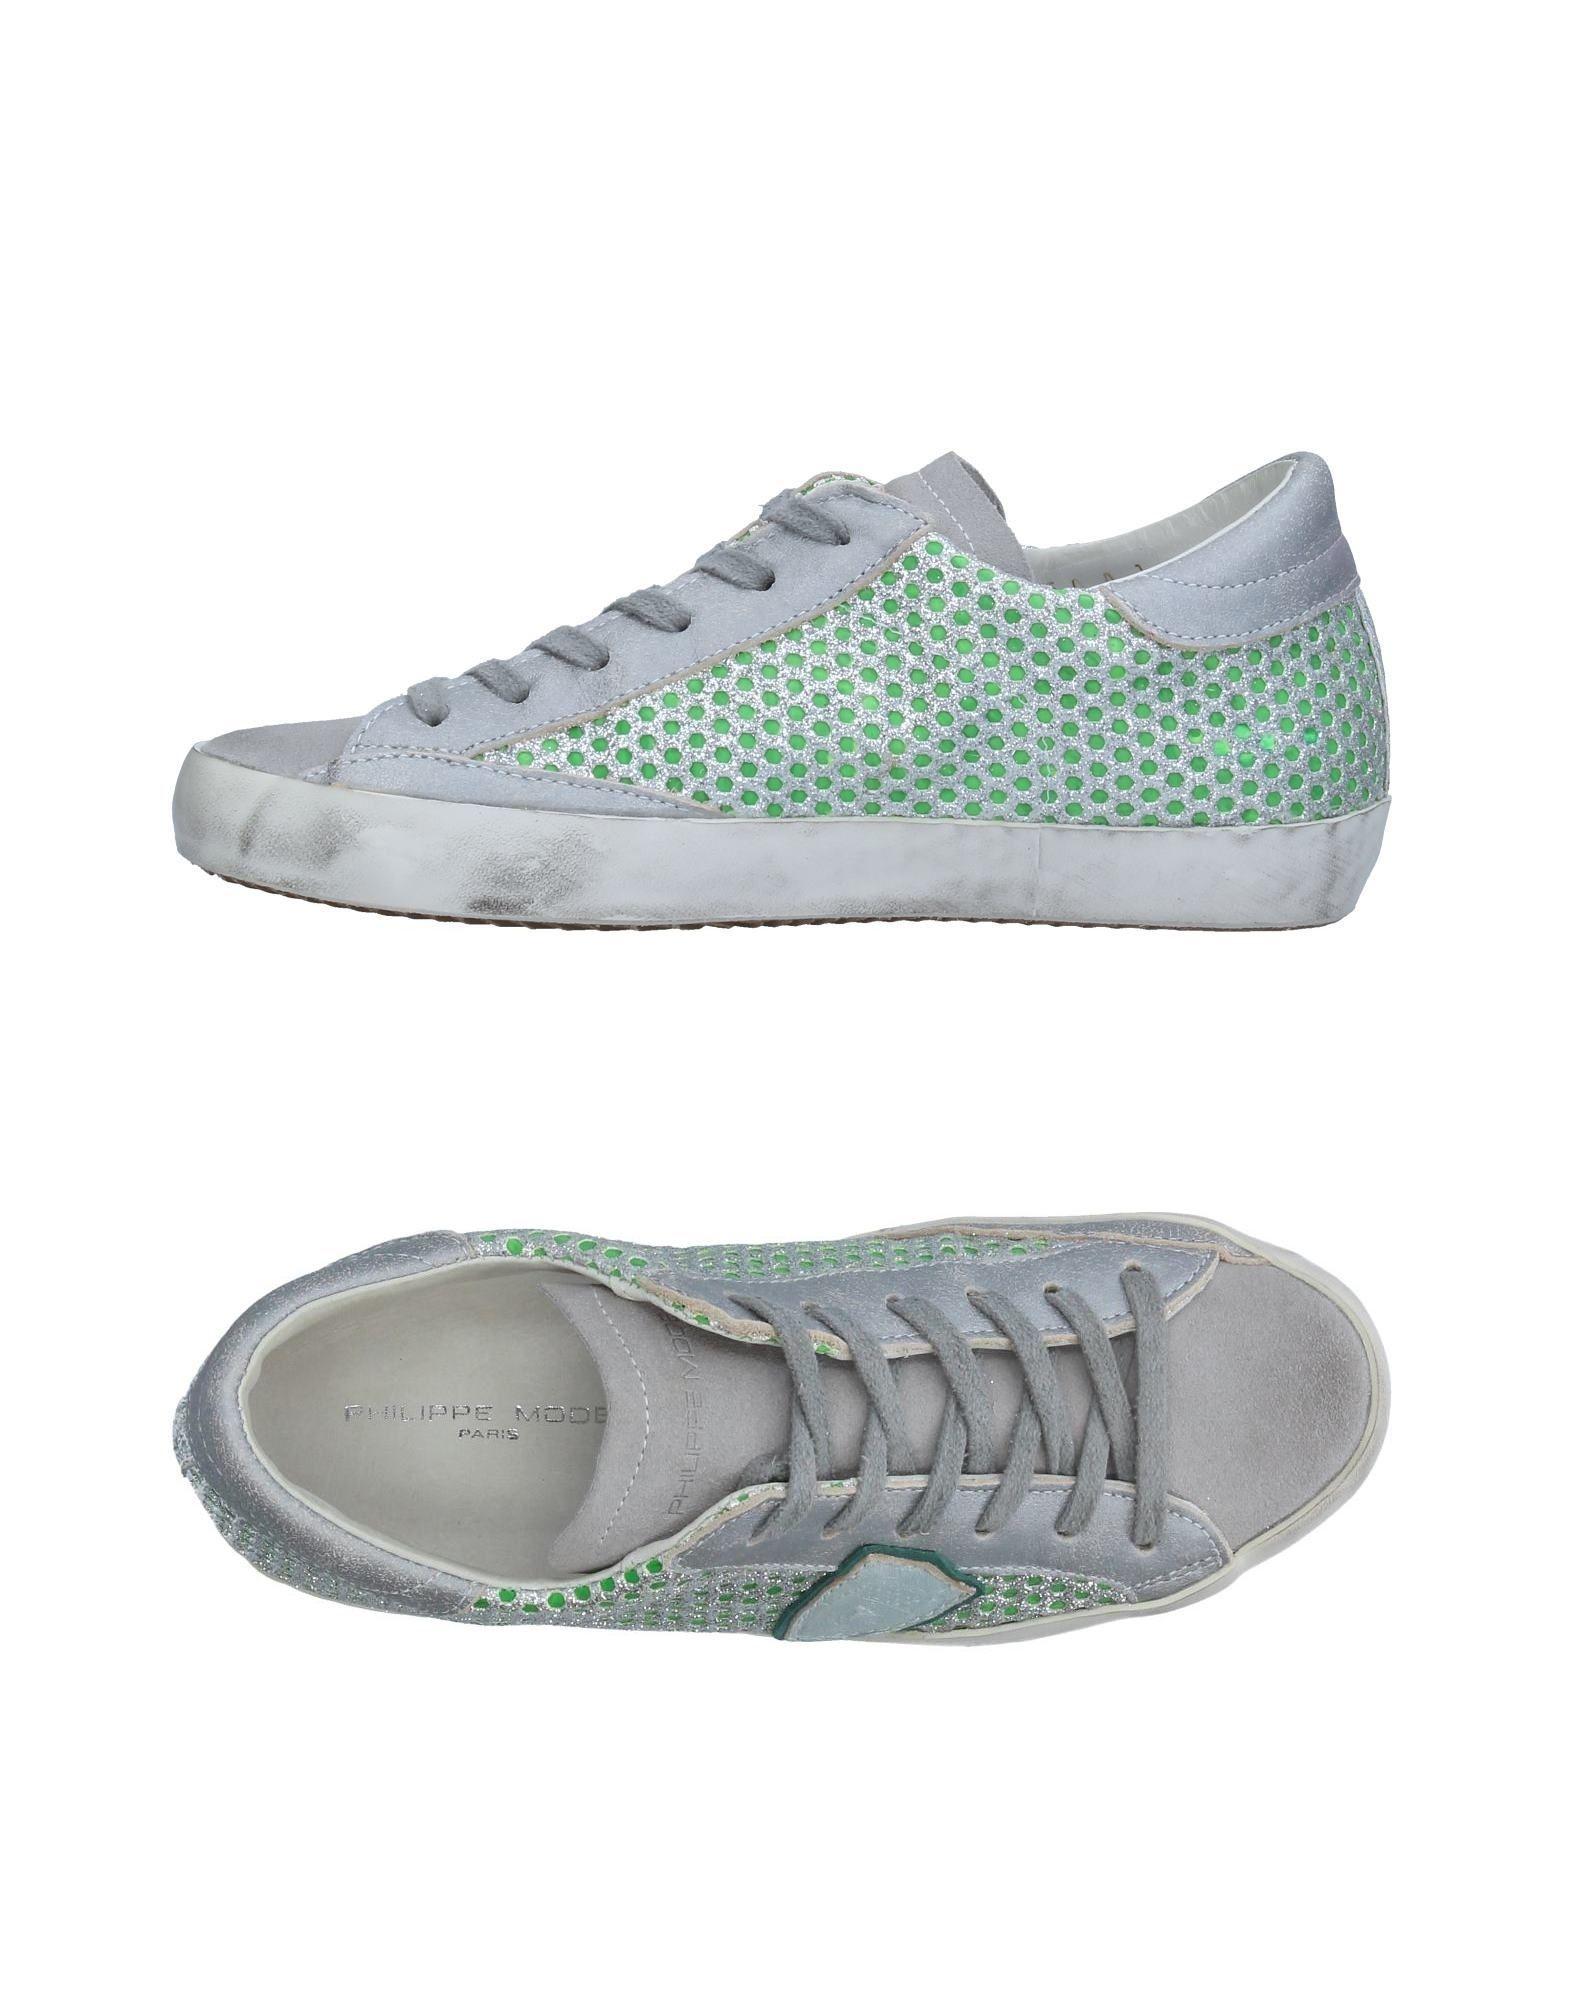 Philippe Model Sneakers - Women Philippe Model Sneakers 11326412KG online on  Australia - 11326412KG Sneakers 48d70d